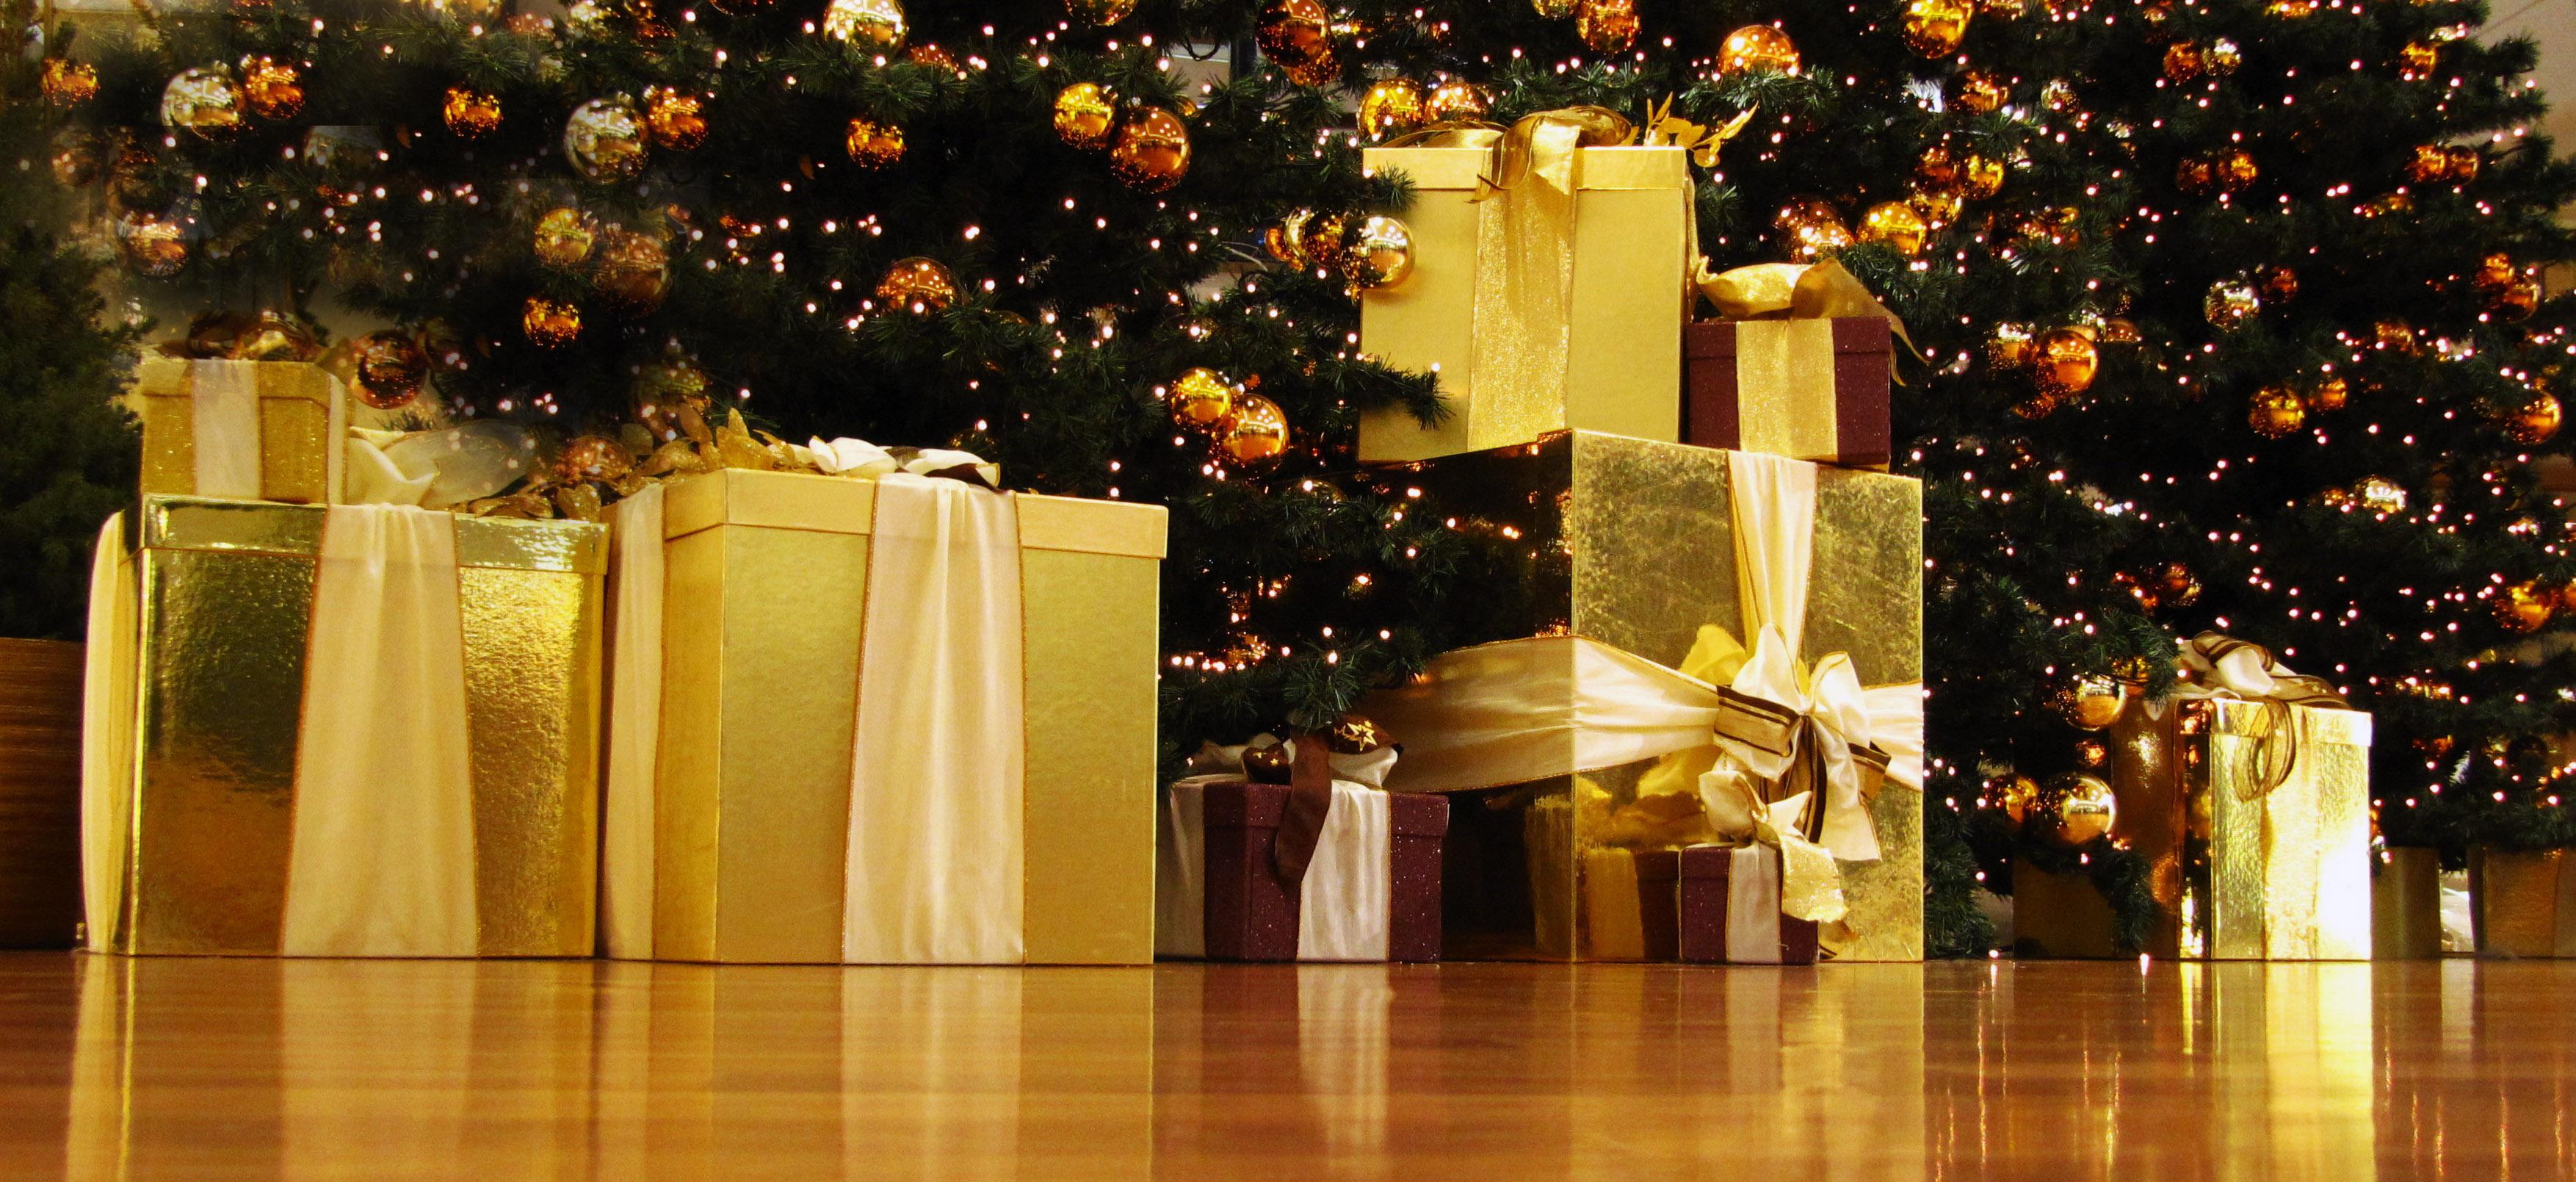 familiengottesdienst an heilig abend weihnachtsfreude. Black Bedroom Furniture Sets. Home Design Ideas